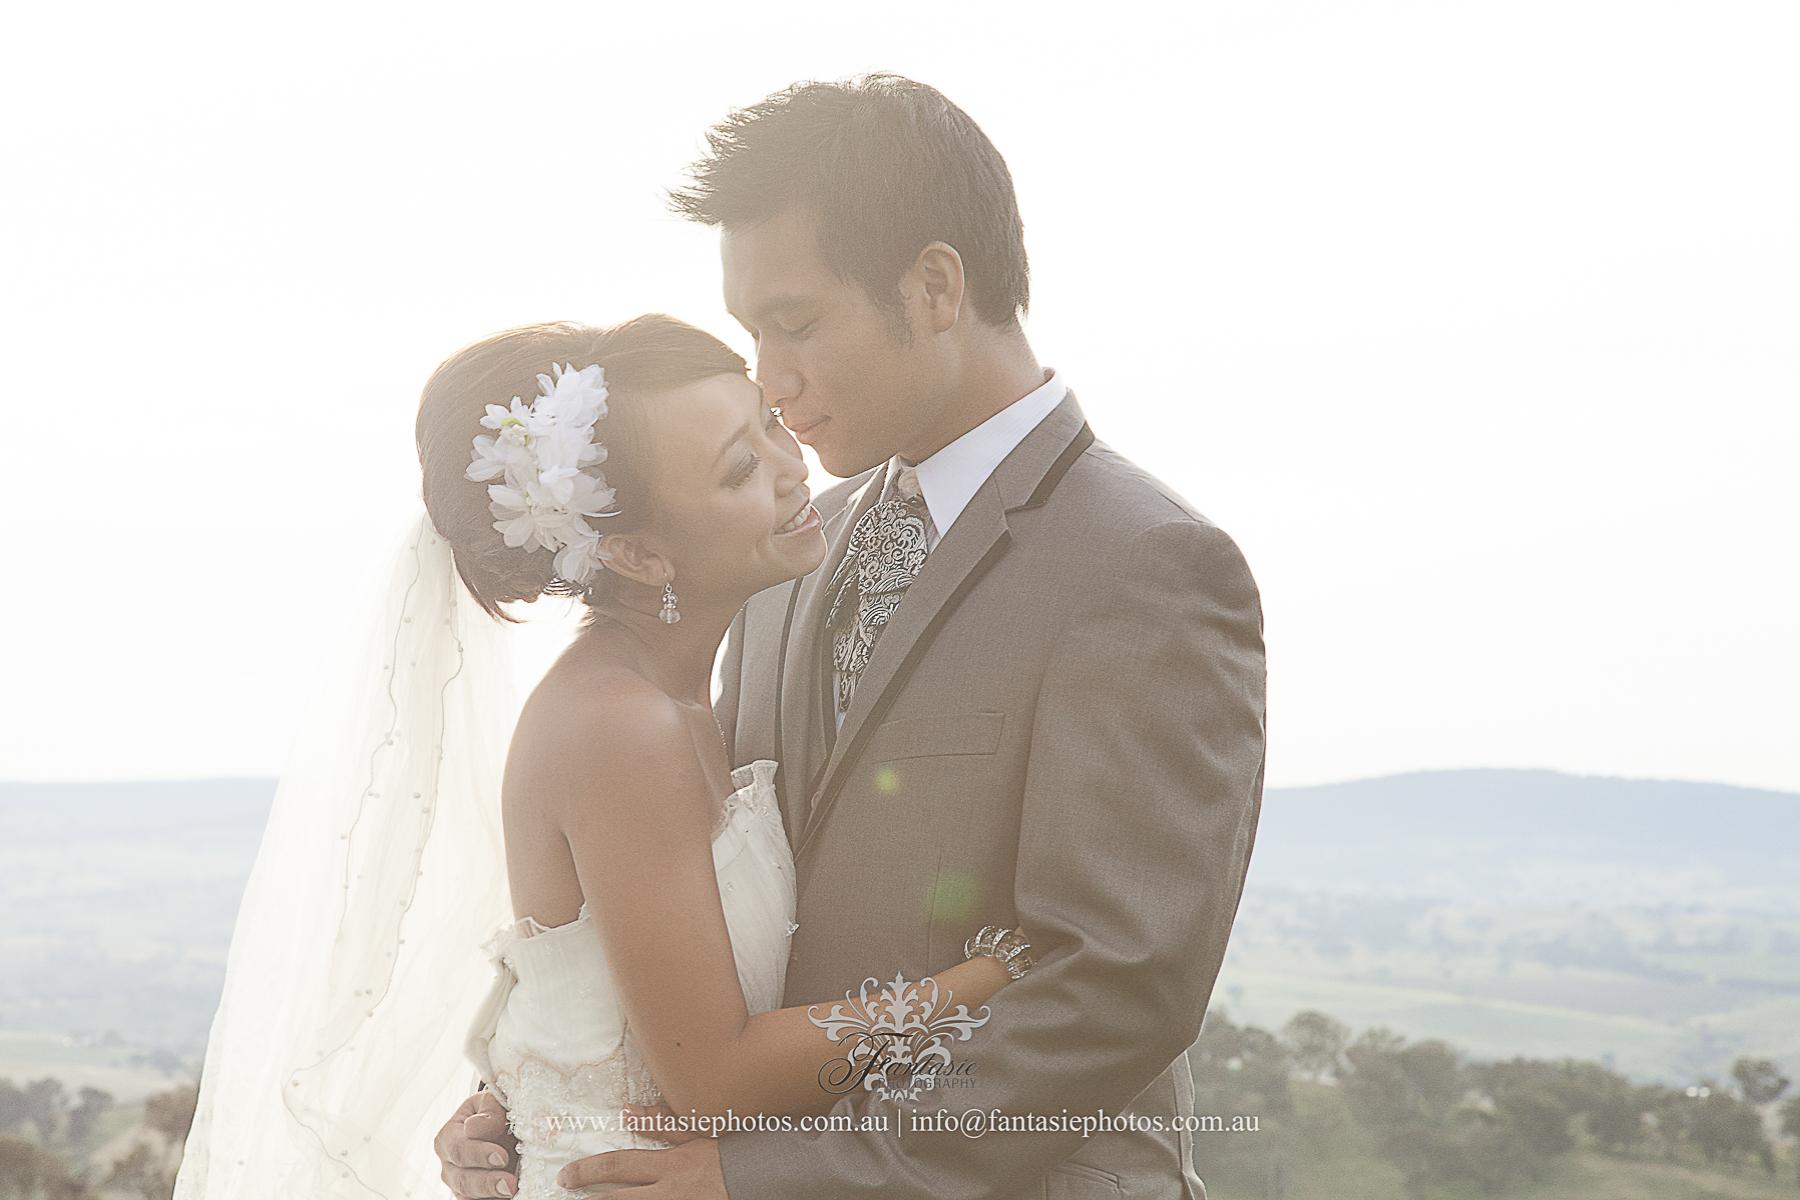 Love Hug Engagement Pre-wedding Shoot at Australia Bathurst Race Course